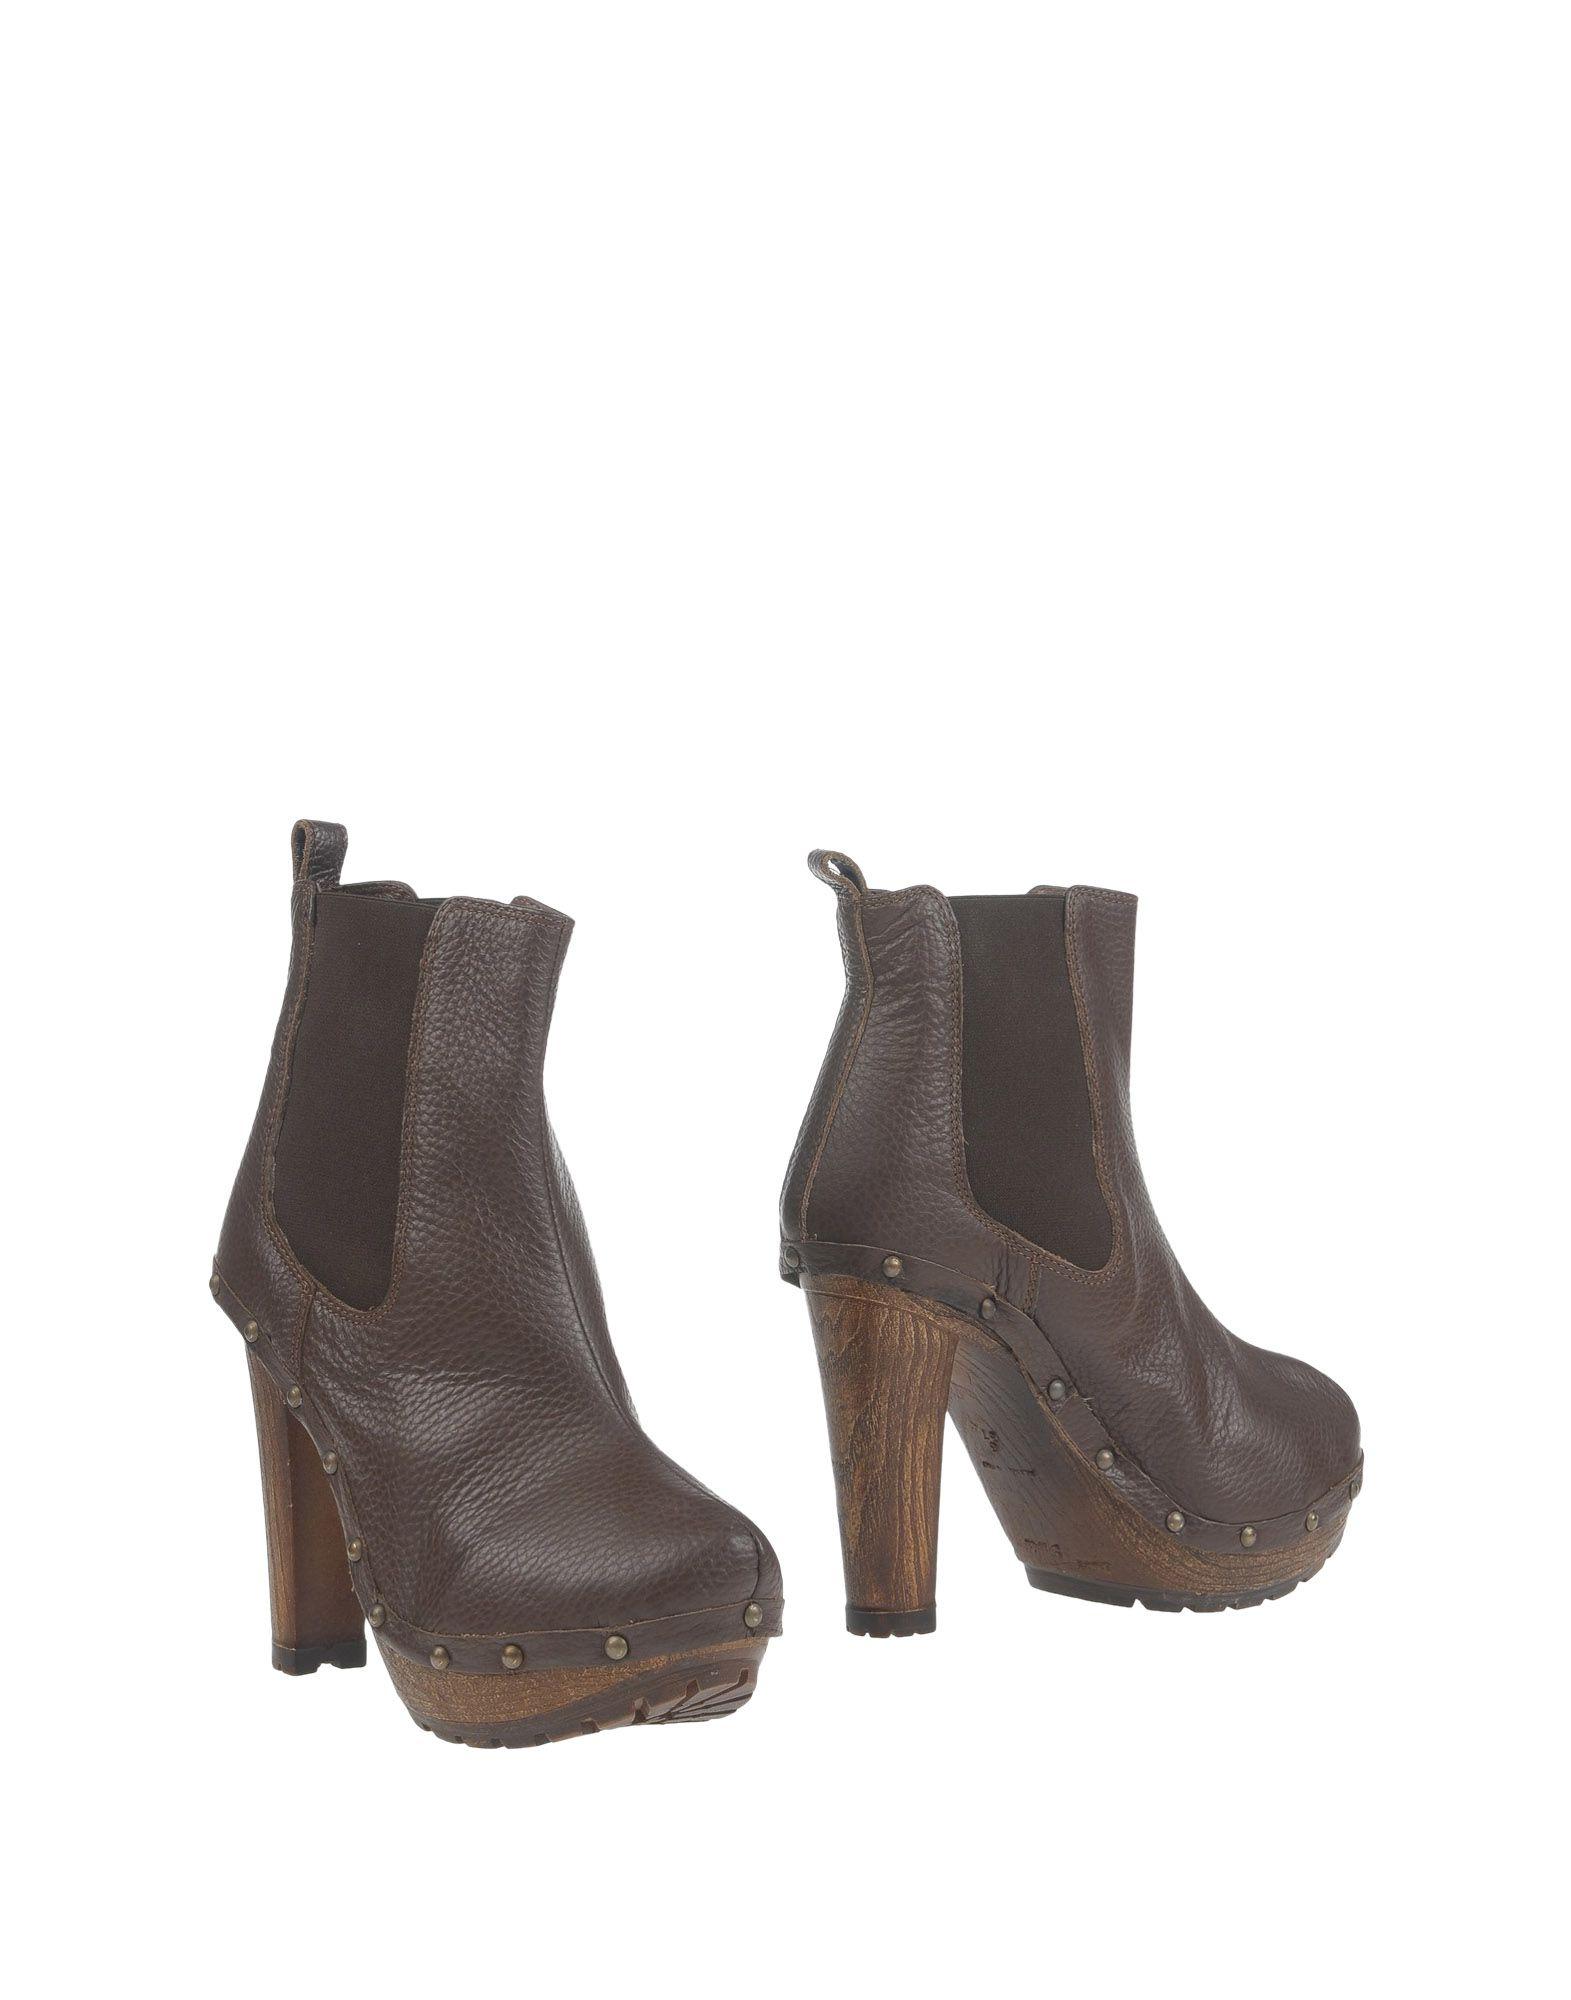 Islo Isabella Lorusso Chelsea Chelsea Chelsea Boots Damen  11303247BG 63ee99